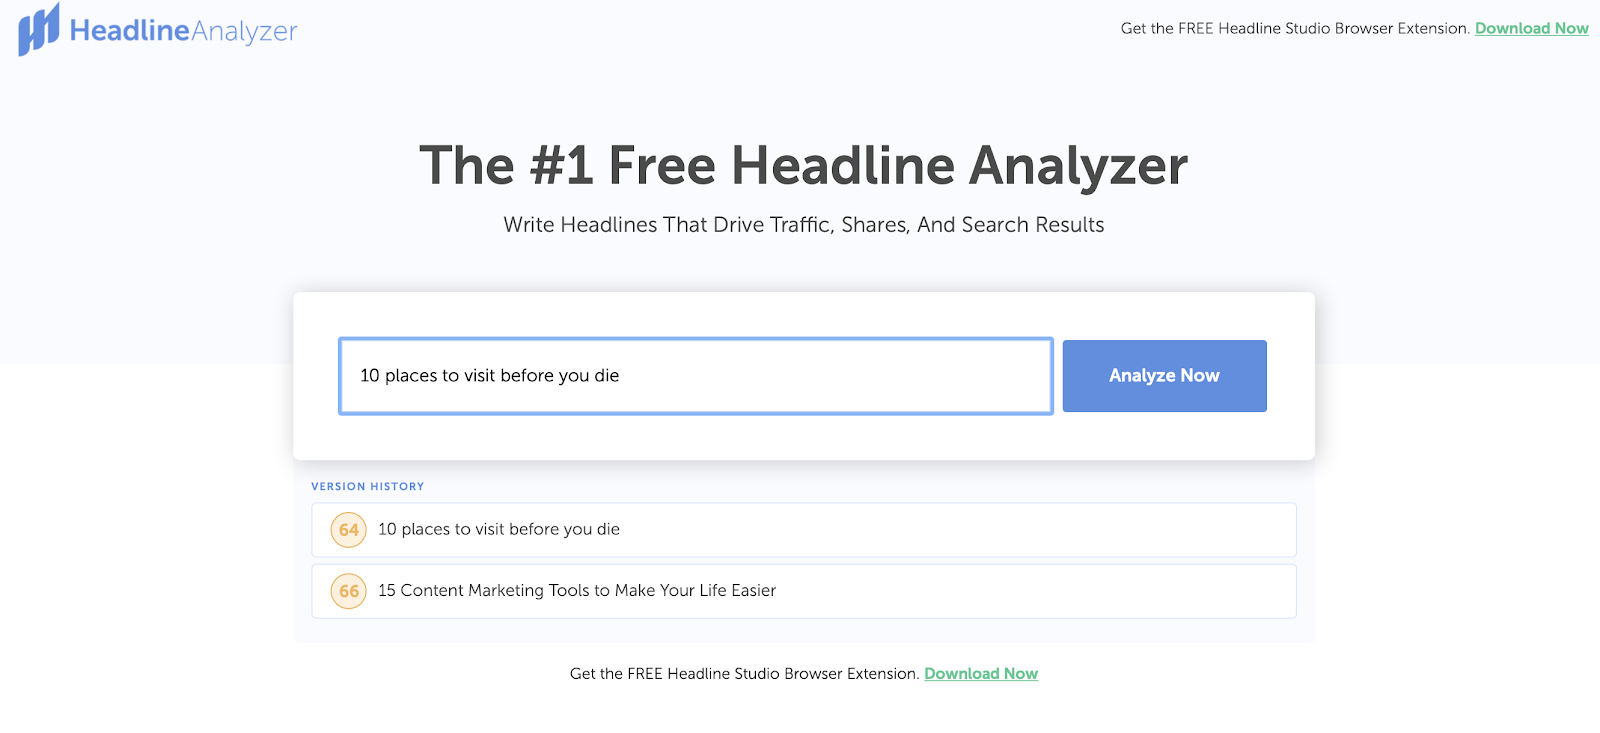 omniscient digital best content marketing tools headline analyzer